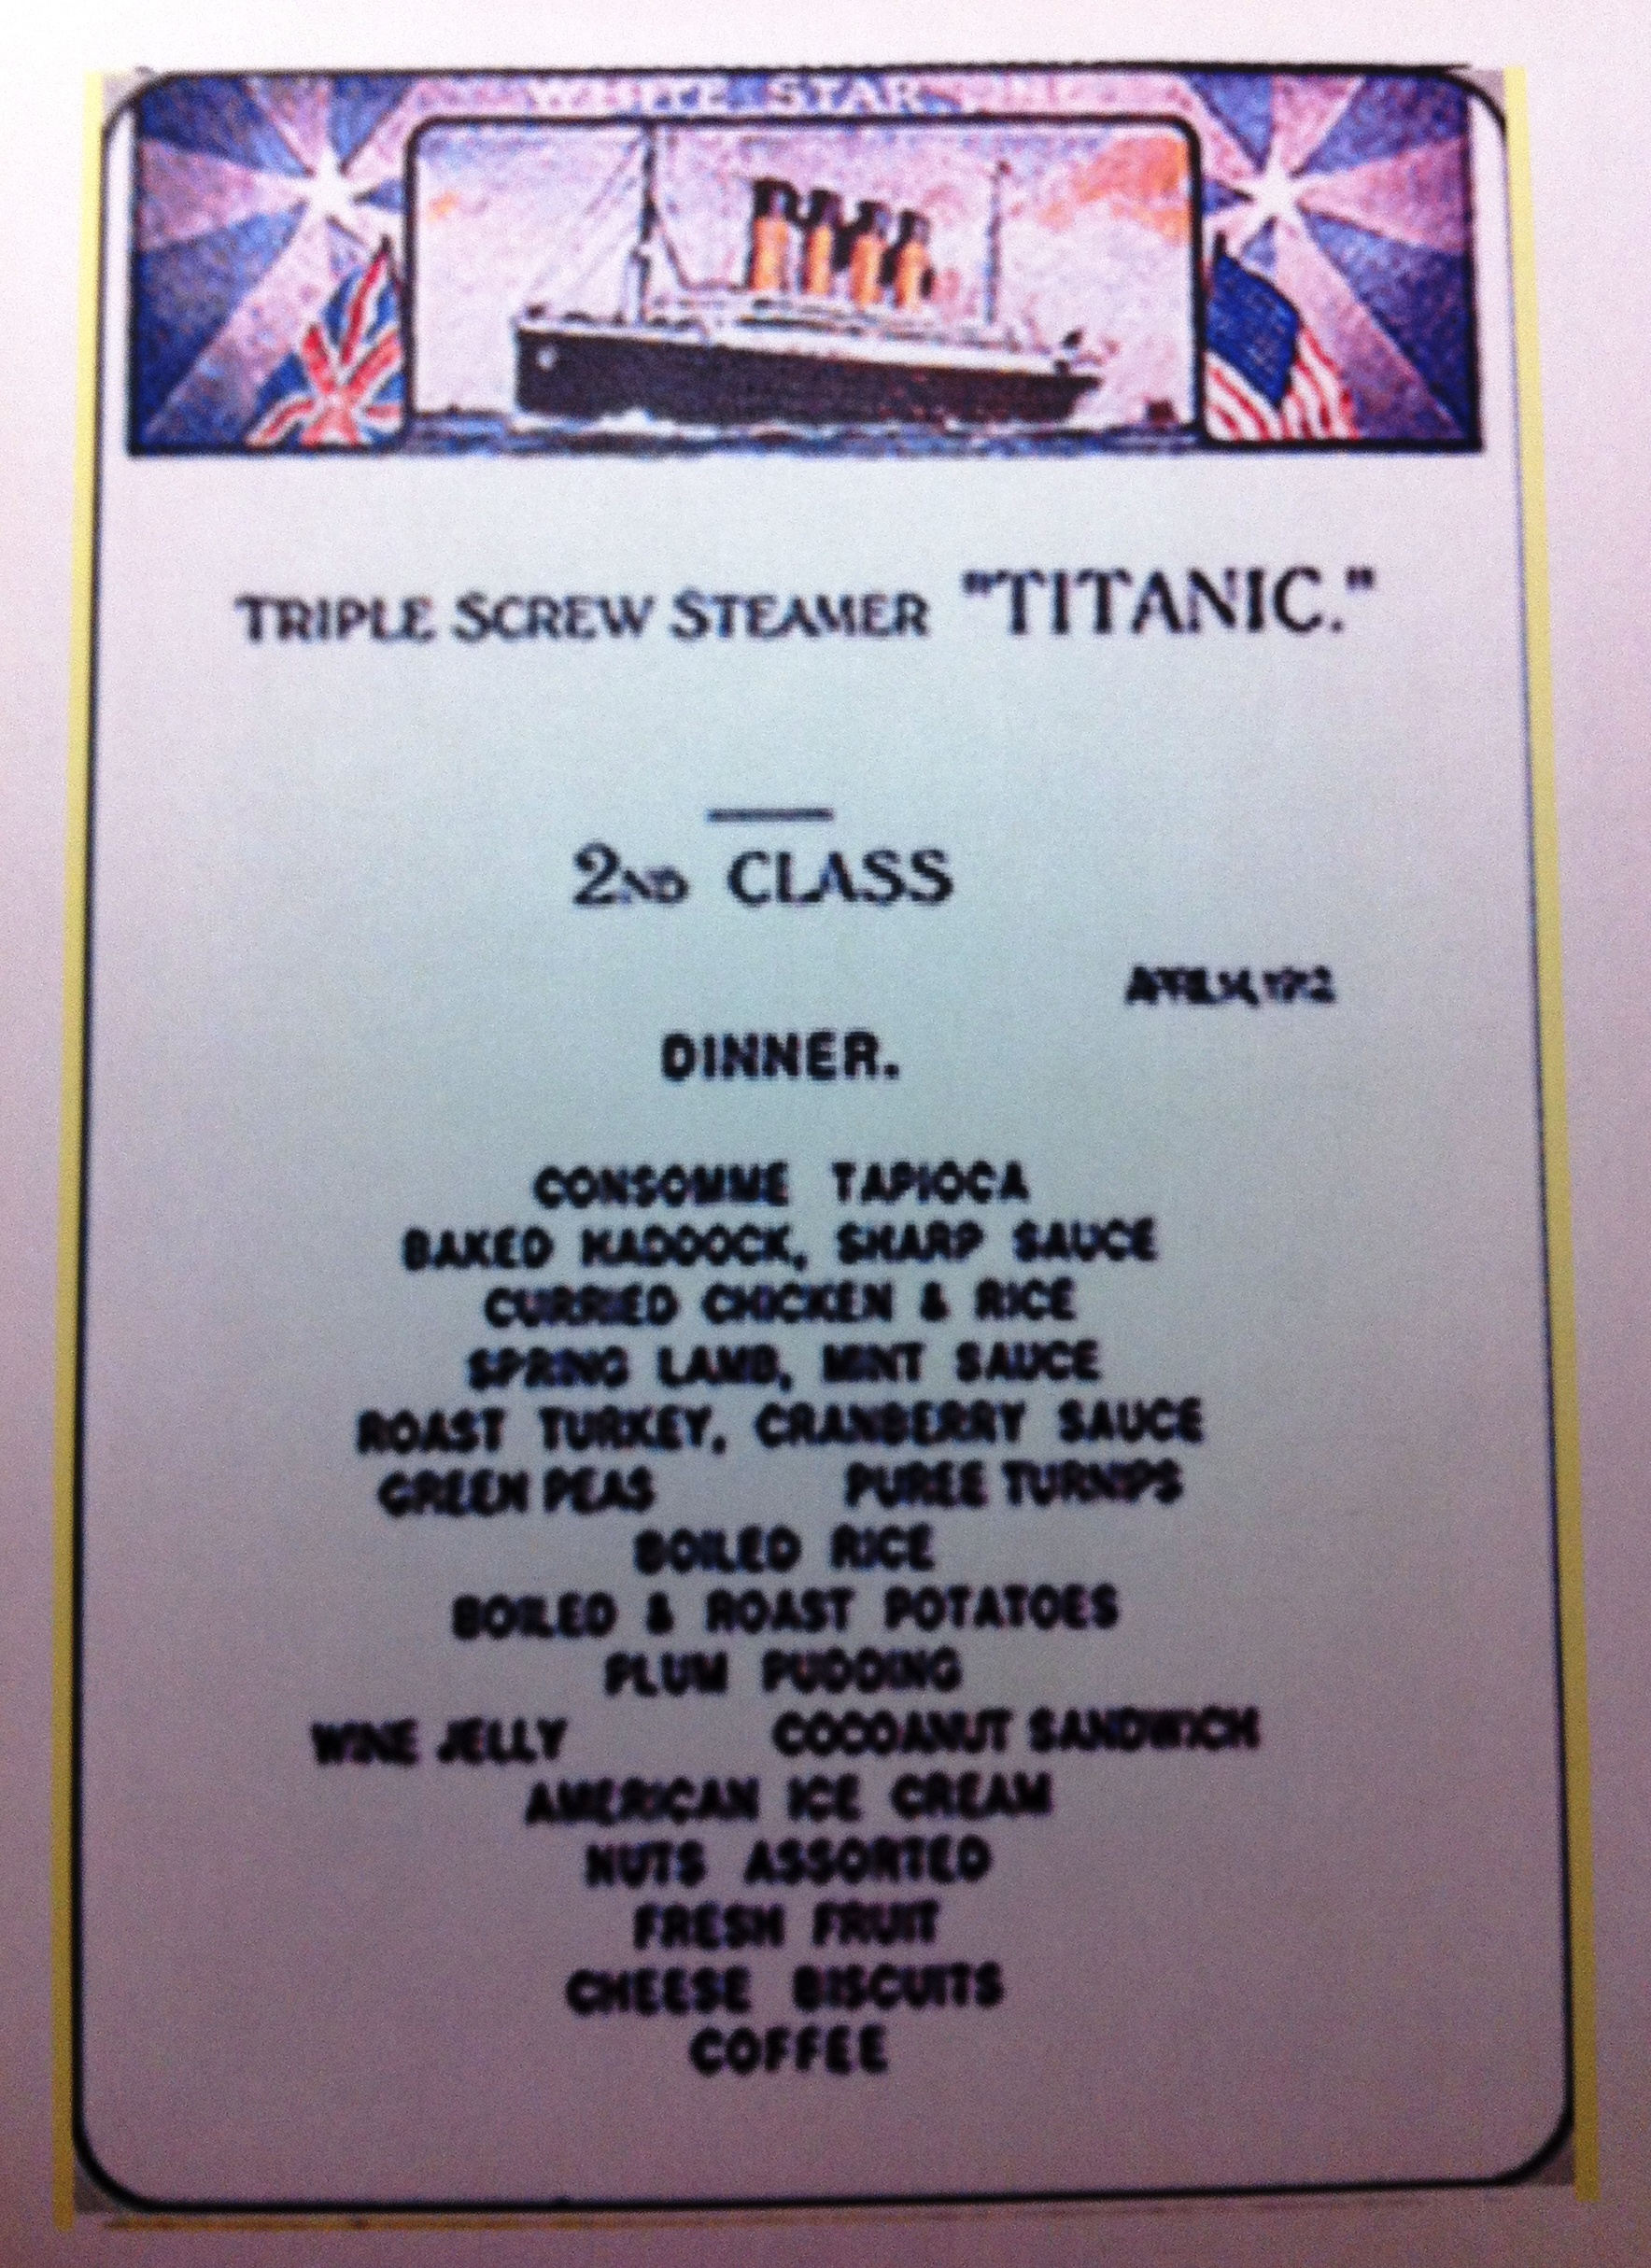 2nd-class-menu1